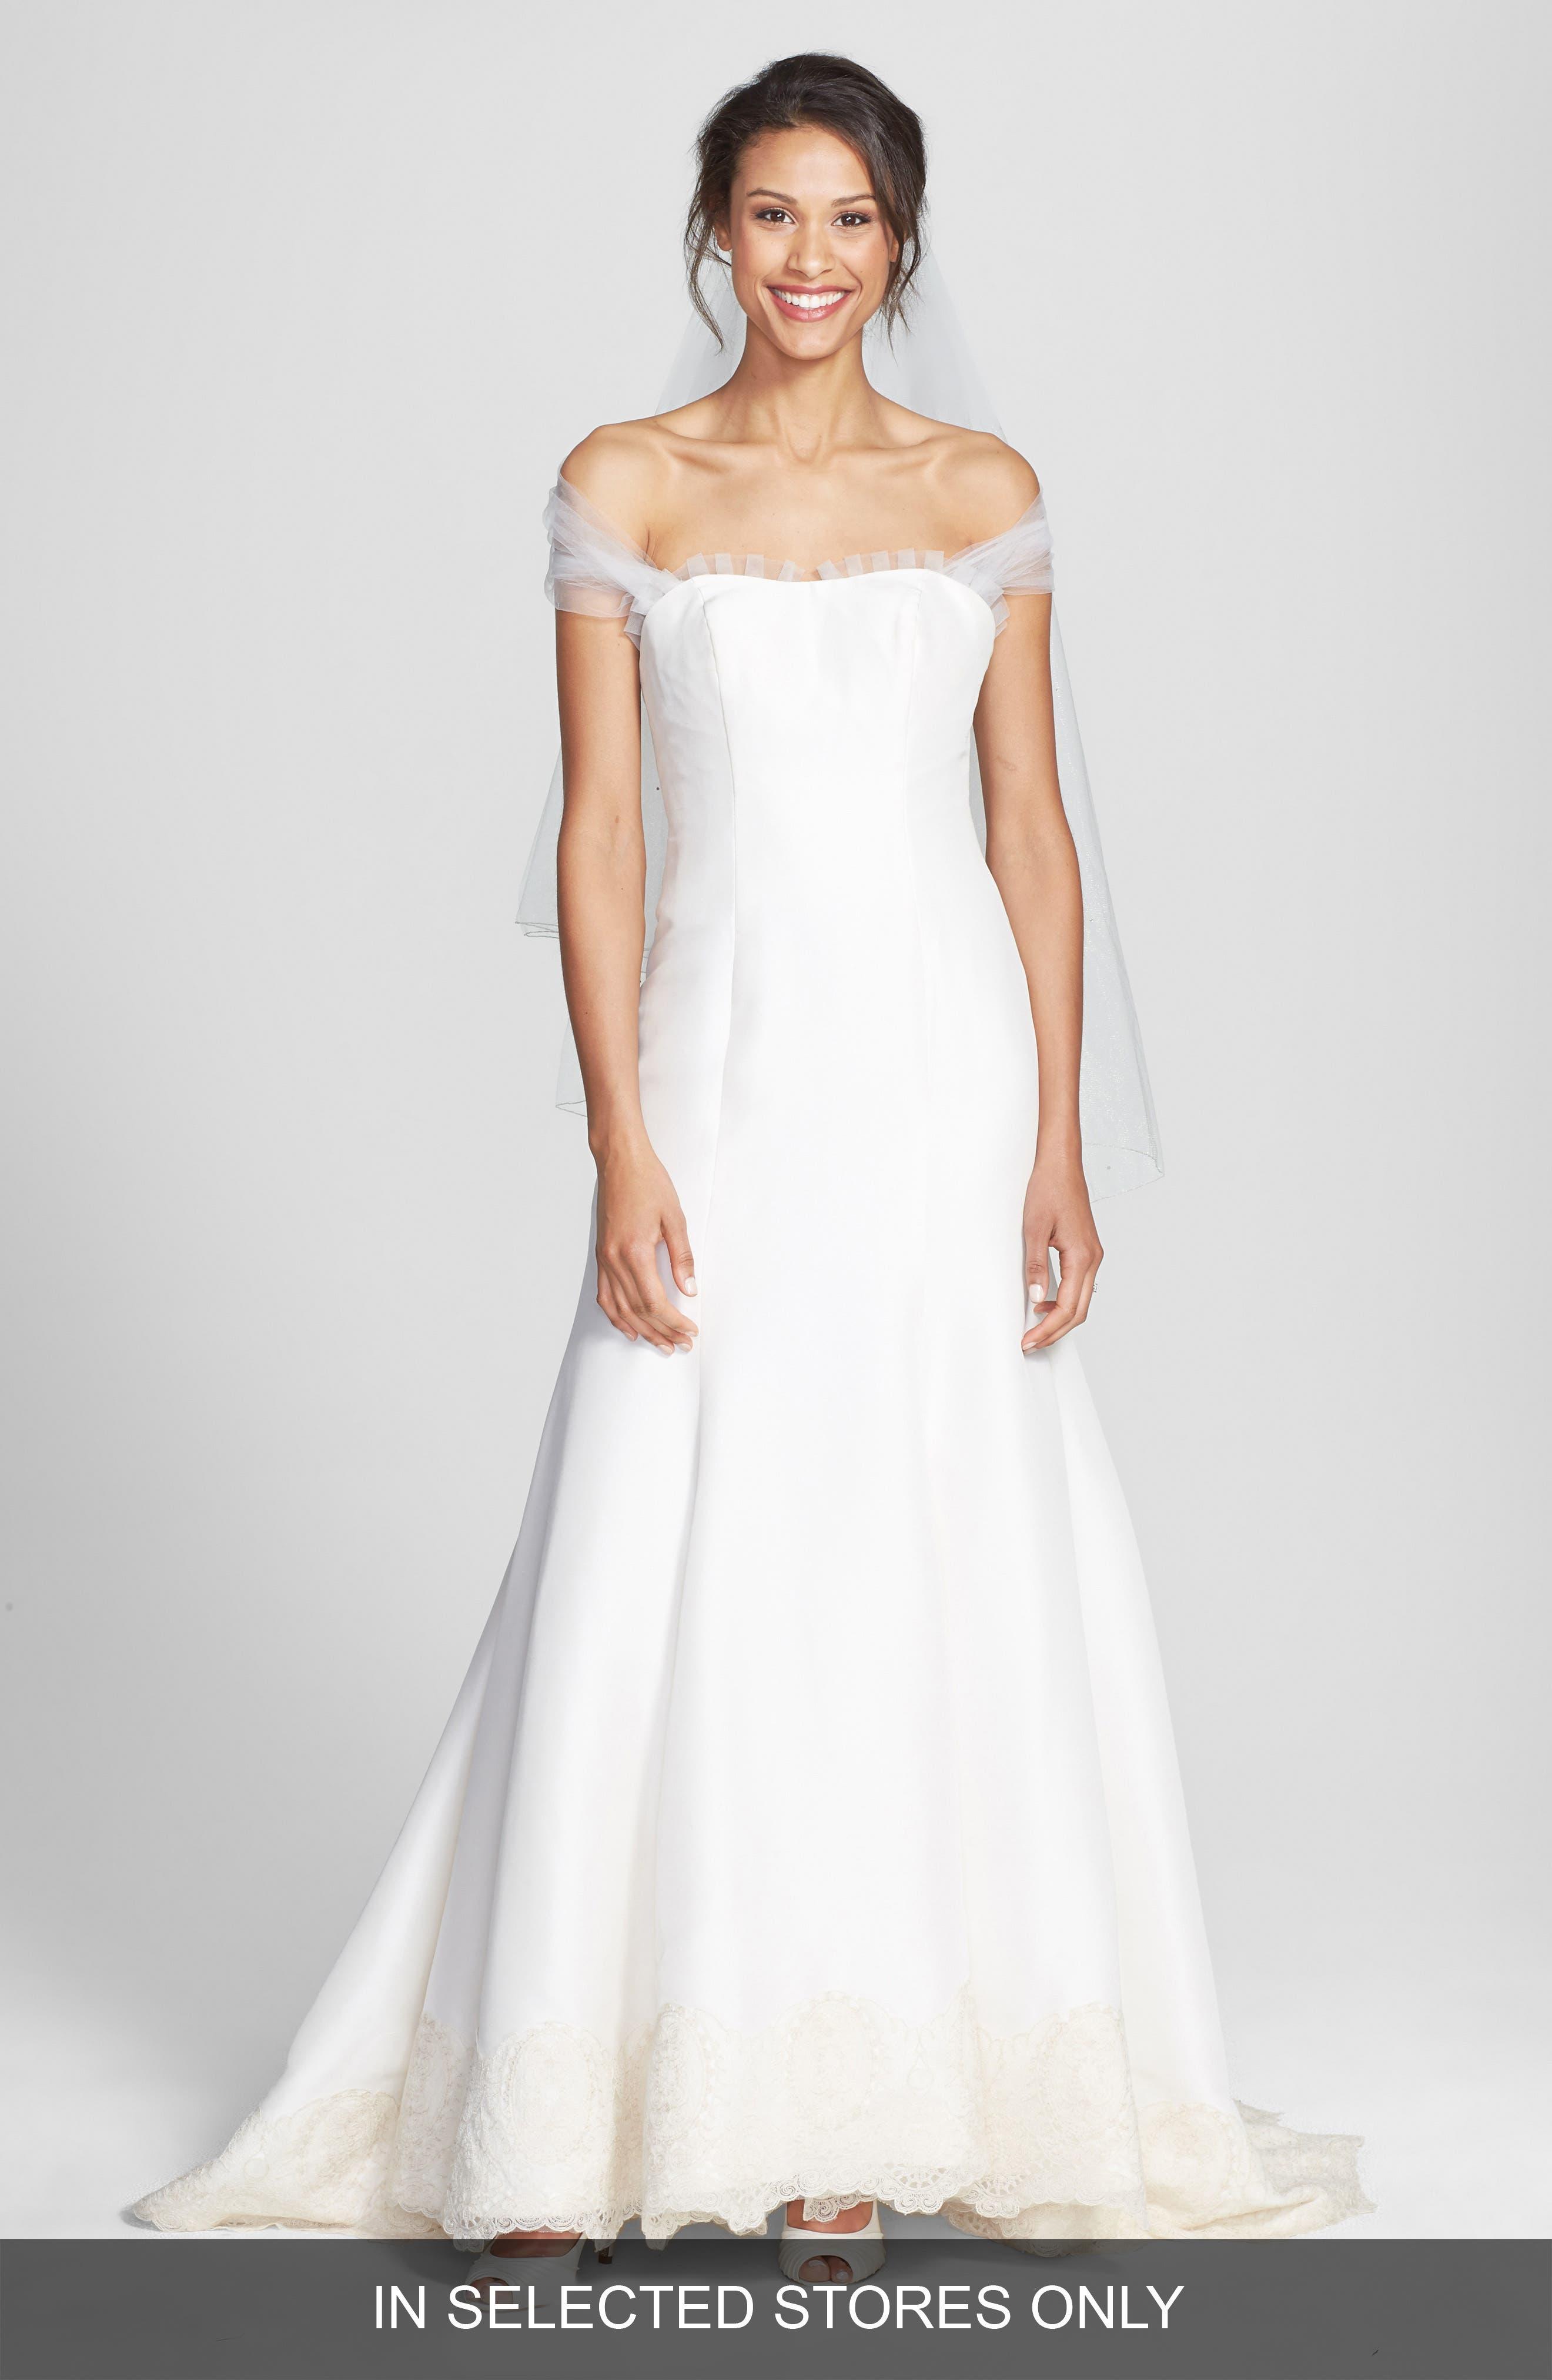 Olia Zavozina Savannah Removable Illusion Halter Lace Trim Silk Shantung Gown